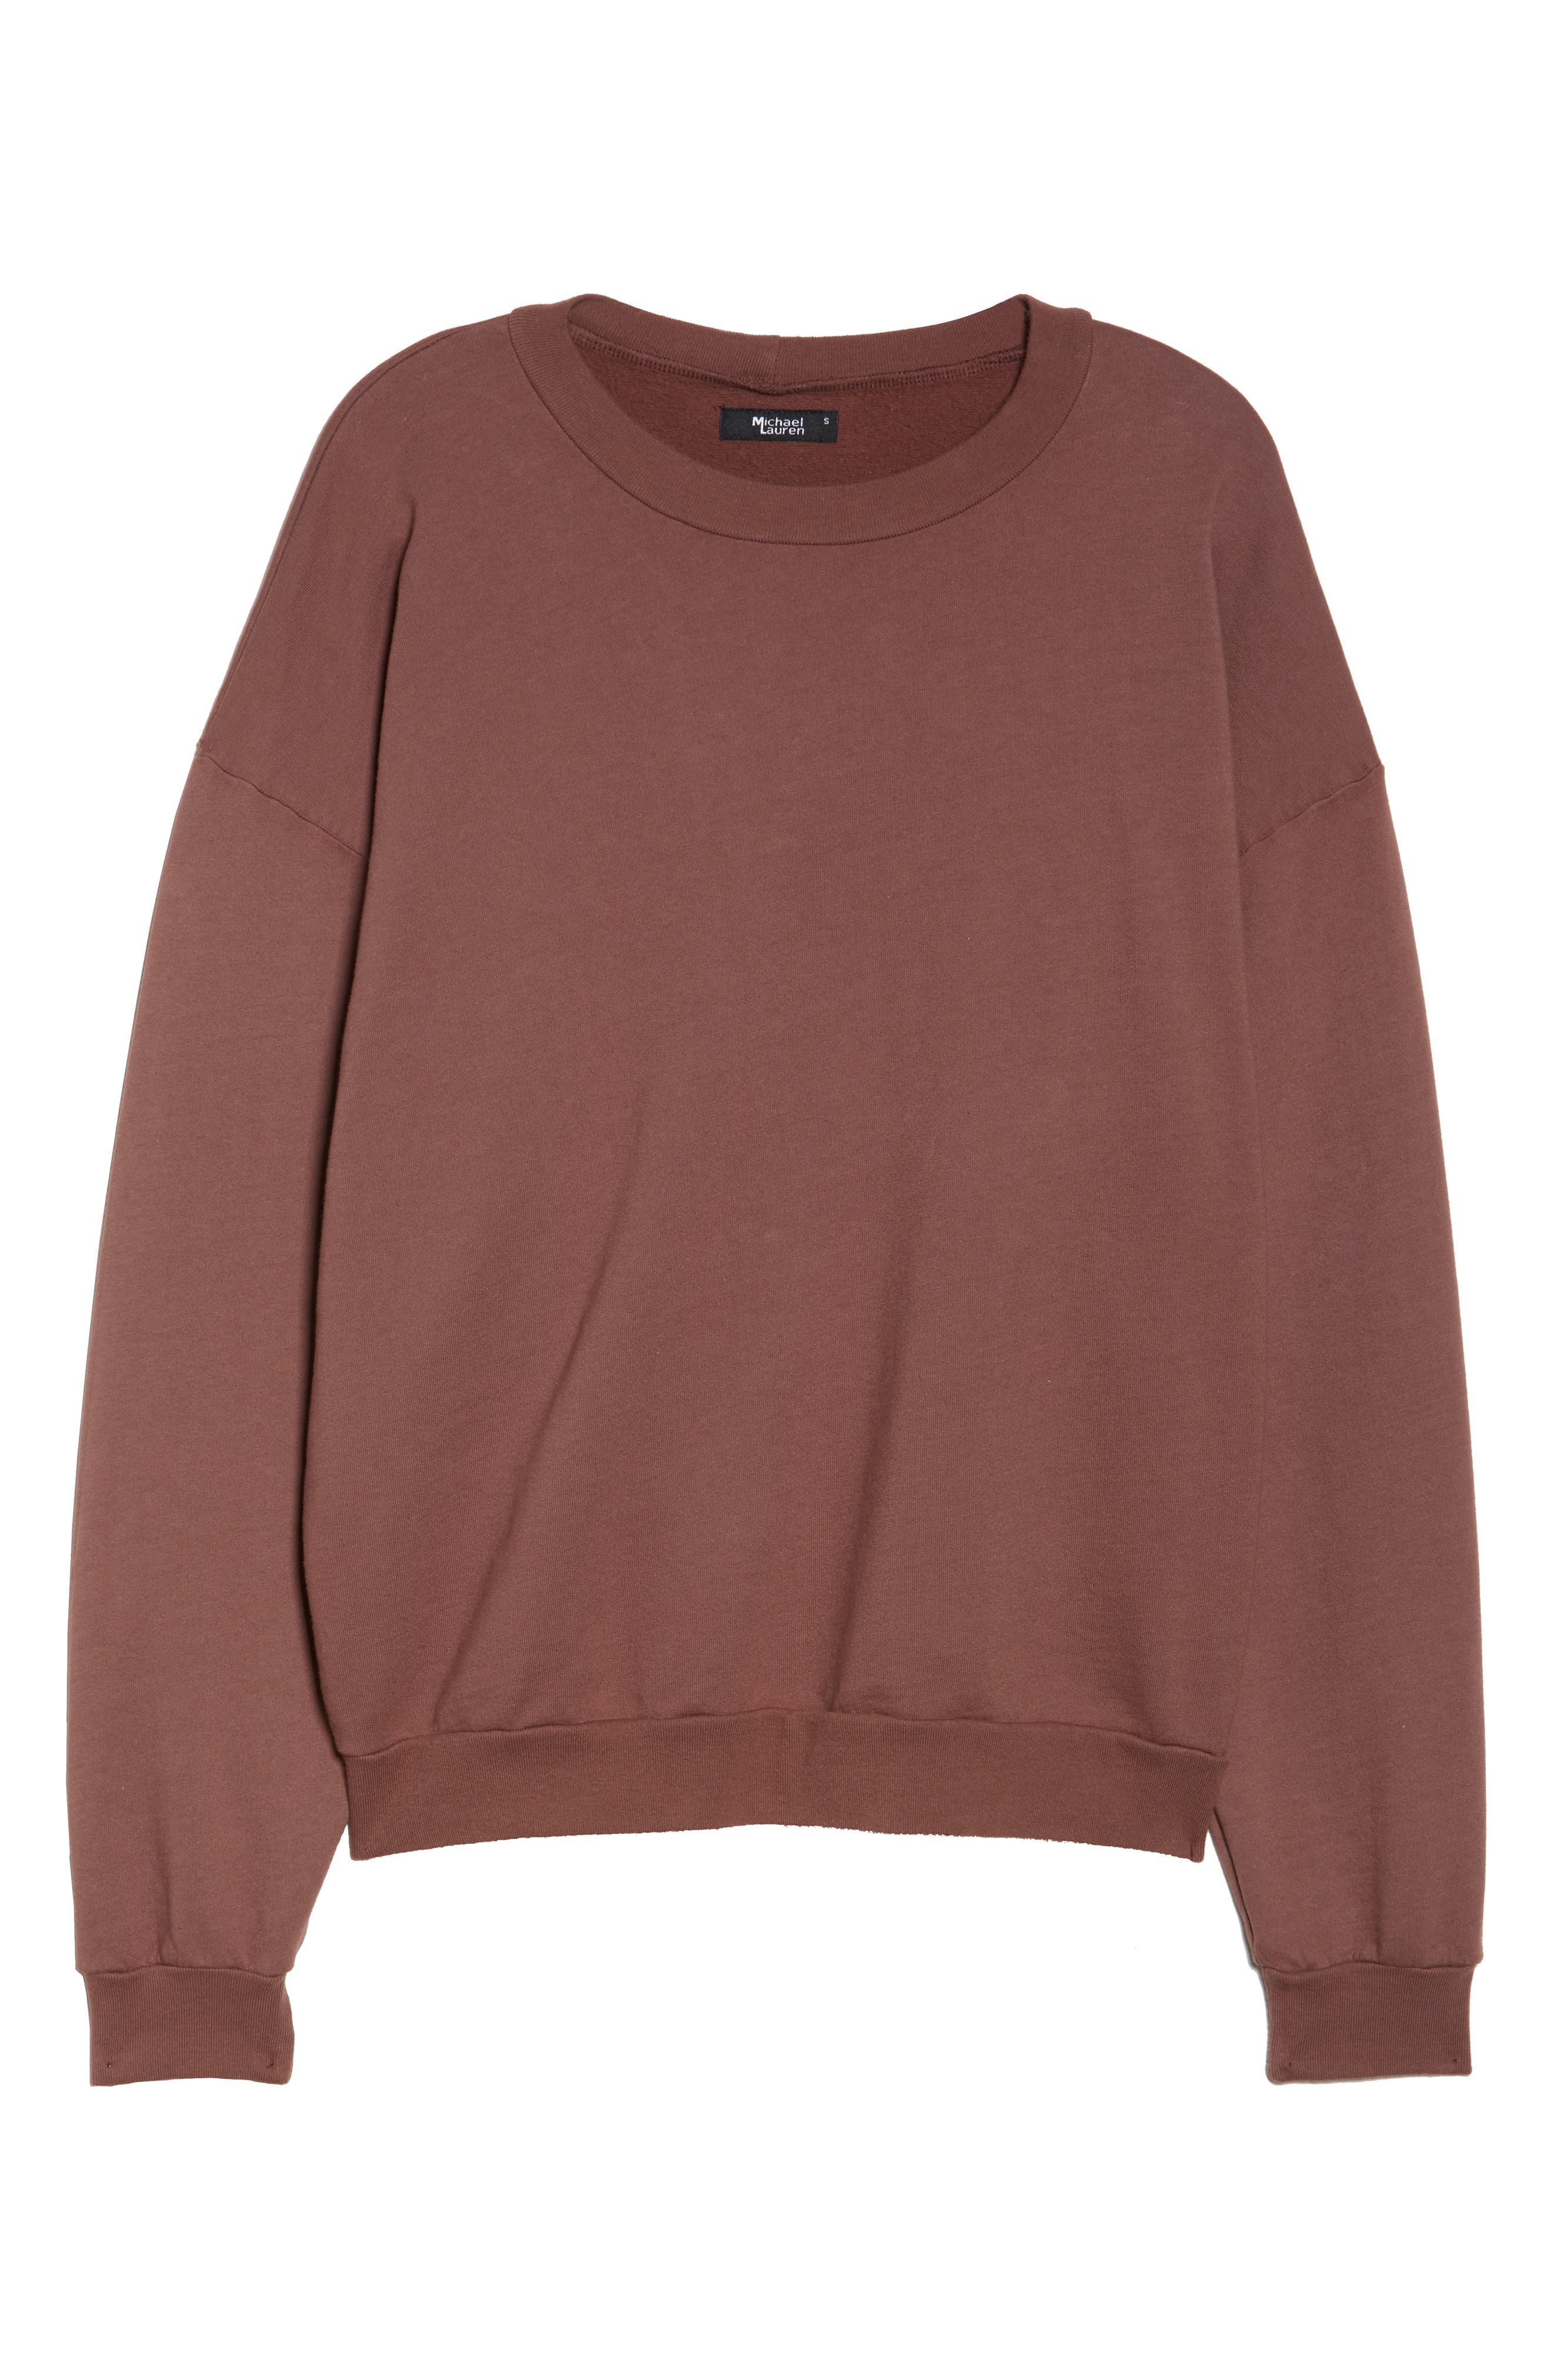 Ellstan Oversize Boyfriend Sweatshirt,                             Alternate thumbnail 12, color,